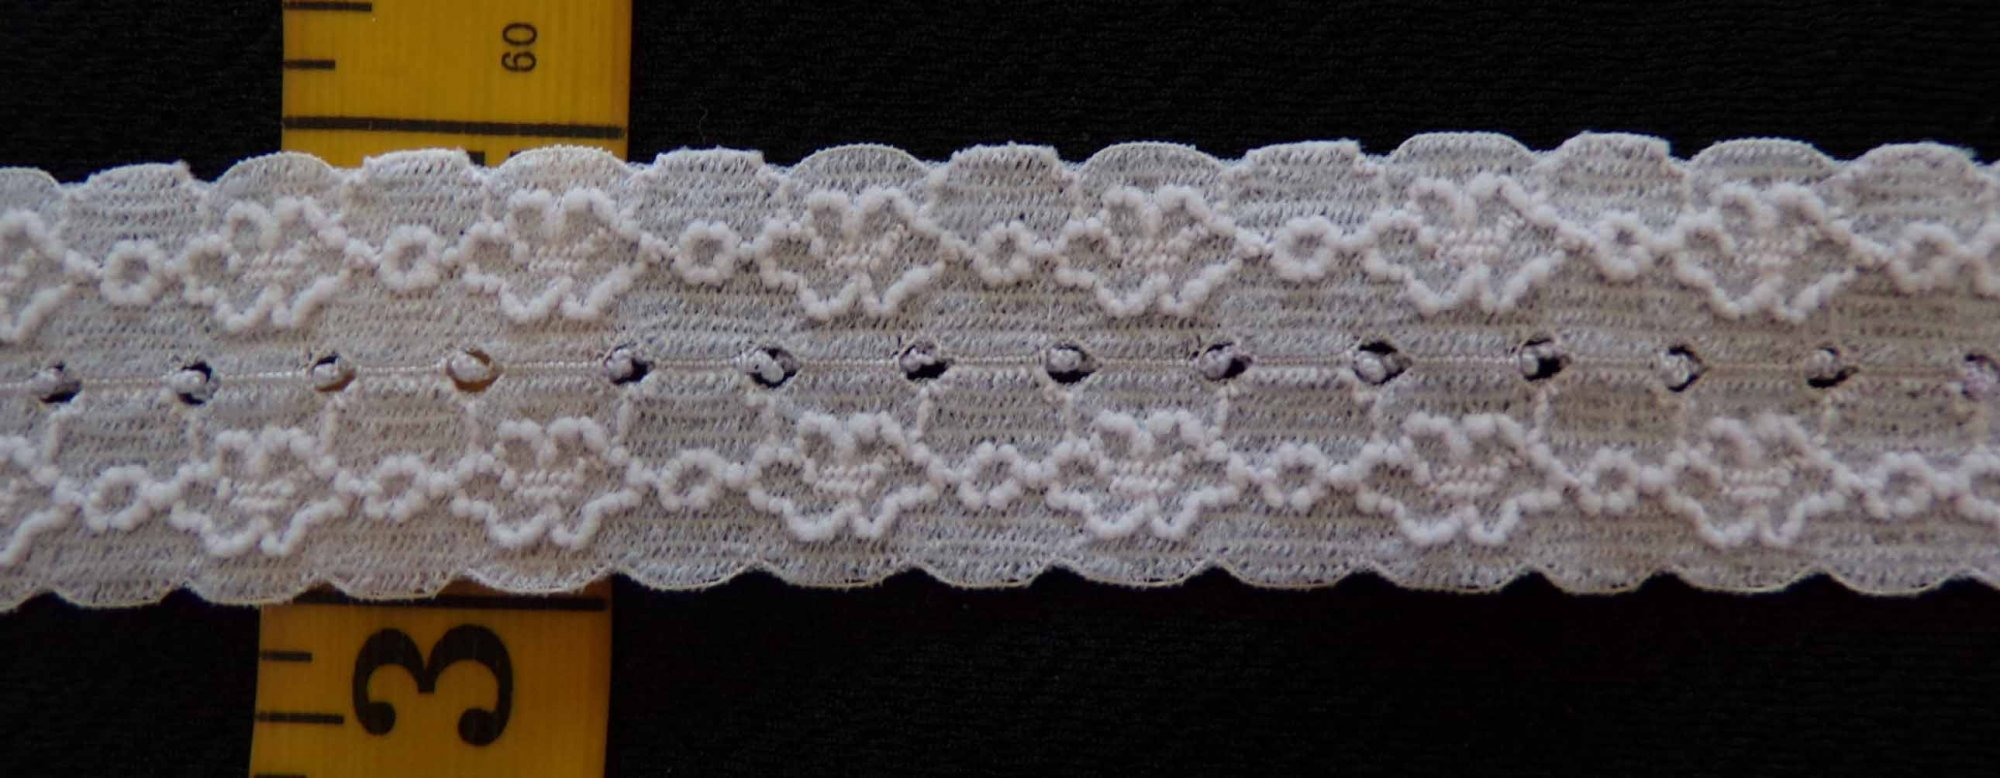 1 Light Gray Stretch lace (LGRSL100)